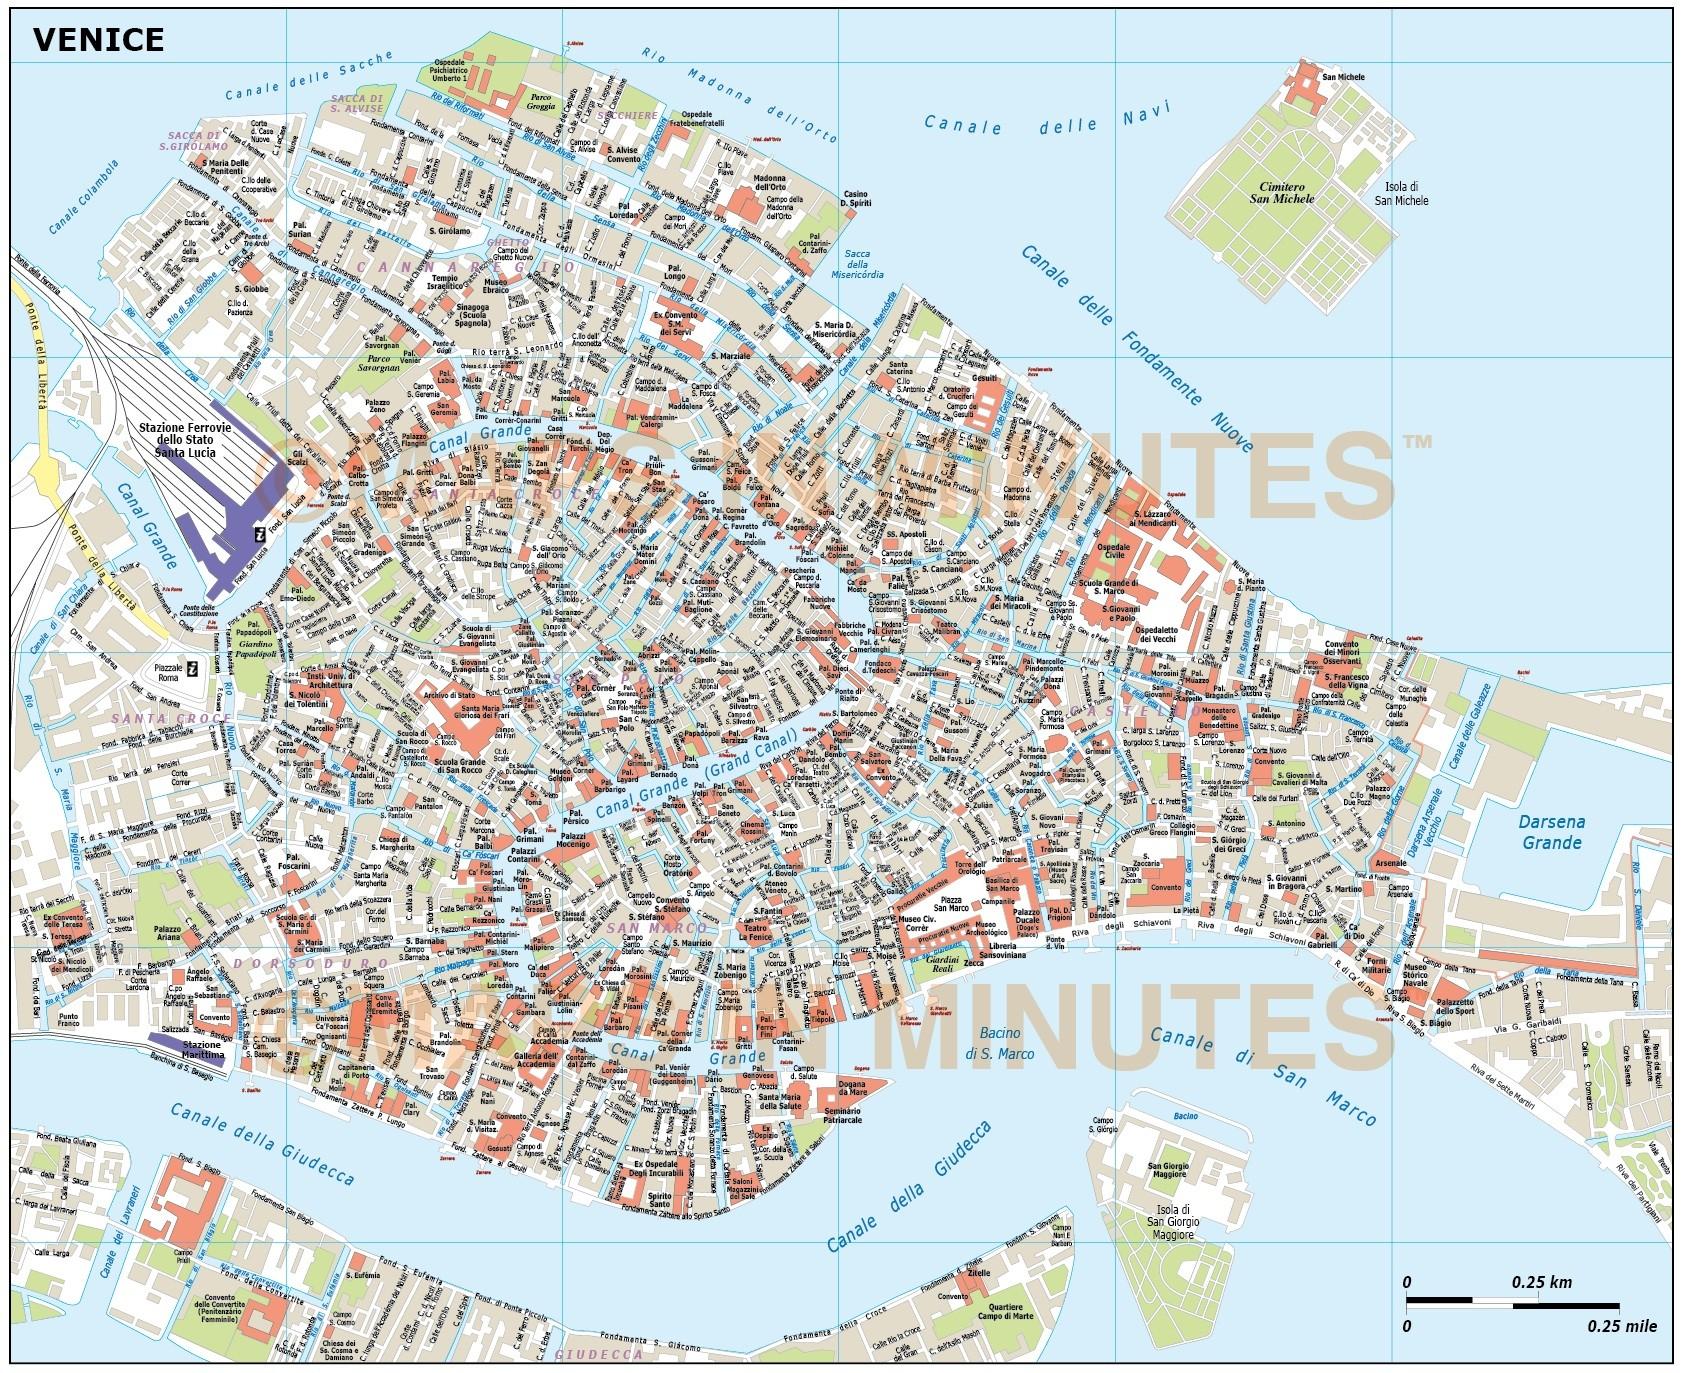 1684x1373 Digital Vector Venice City Royalty Free Map In Illustrator Or Pdf